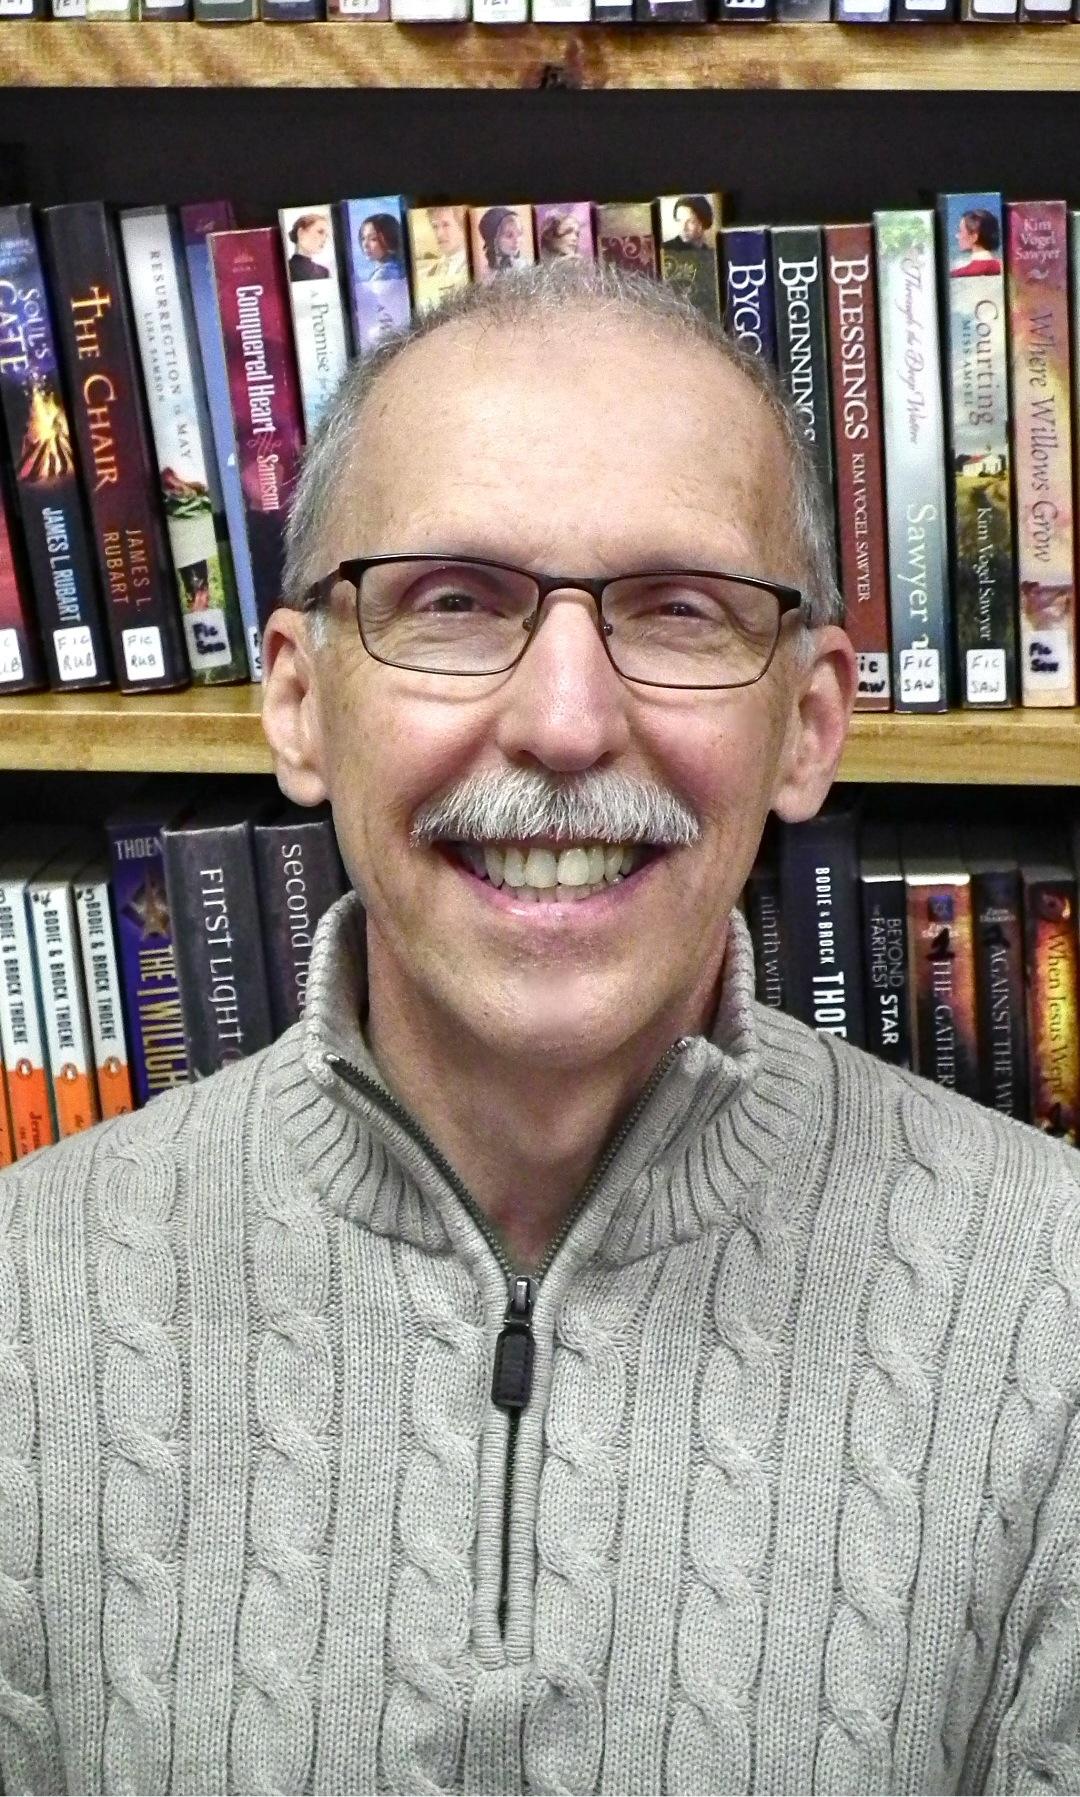 Greg Phenicie